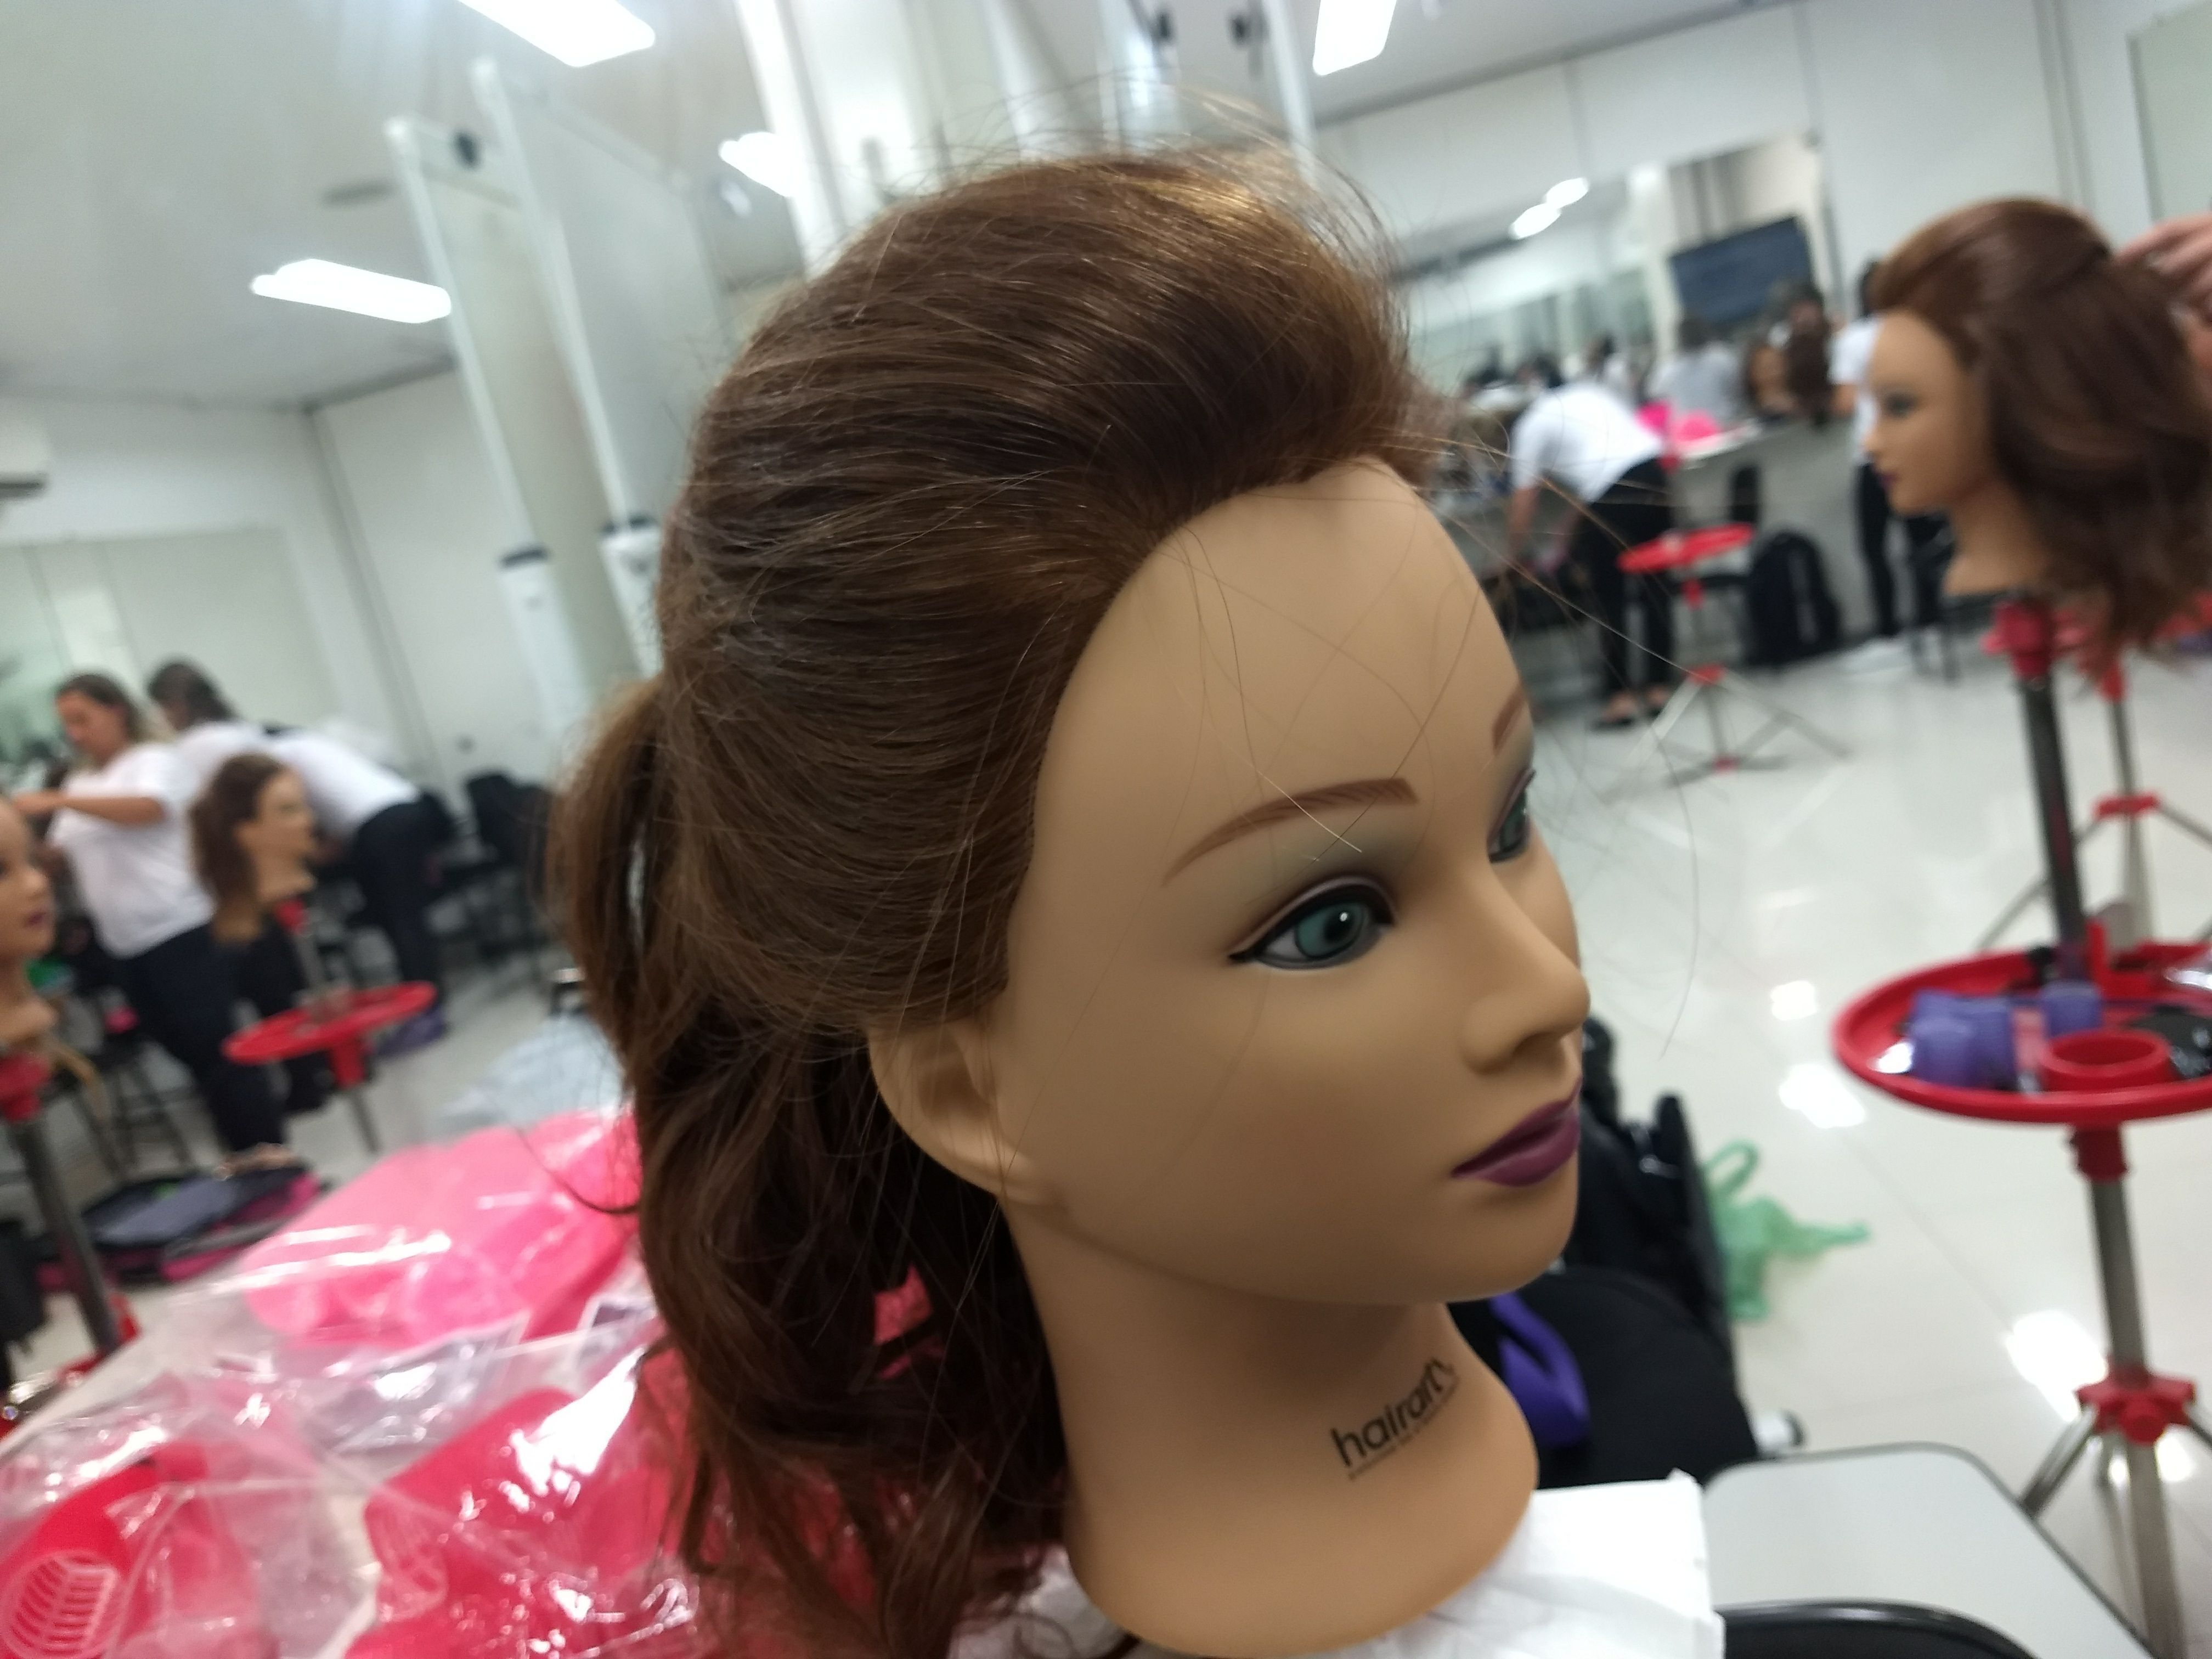 Frontal penteado moicano com volume. cabelo auxiliar cabeleireiro(a) auxiliar cabeleireiro(a)